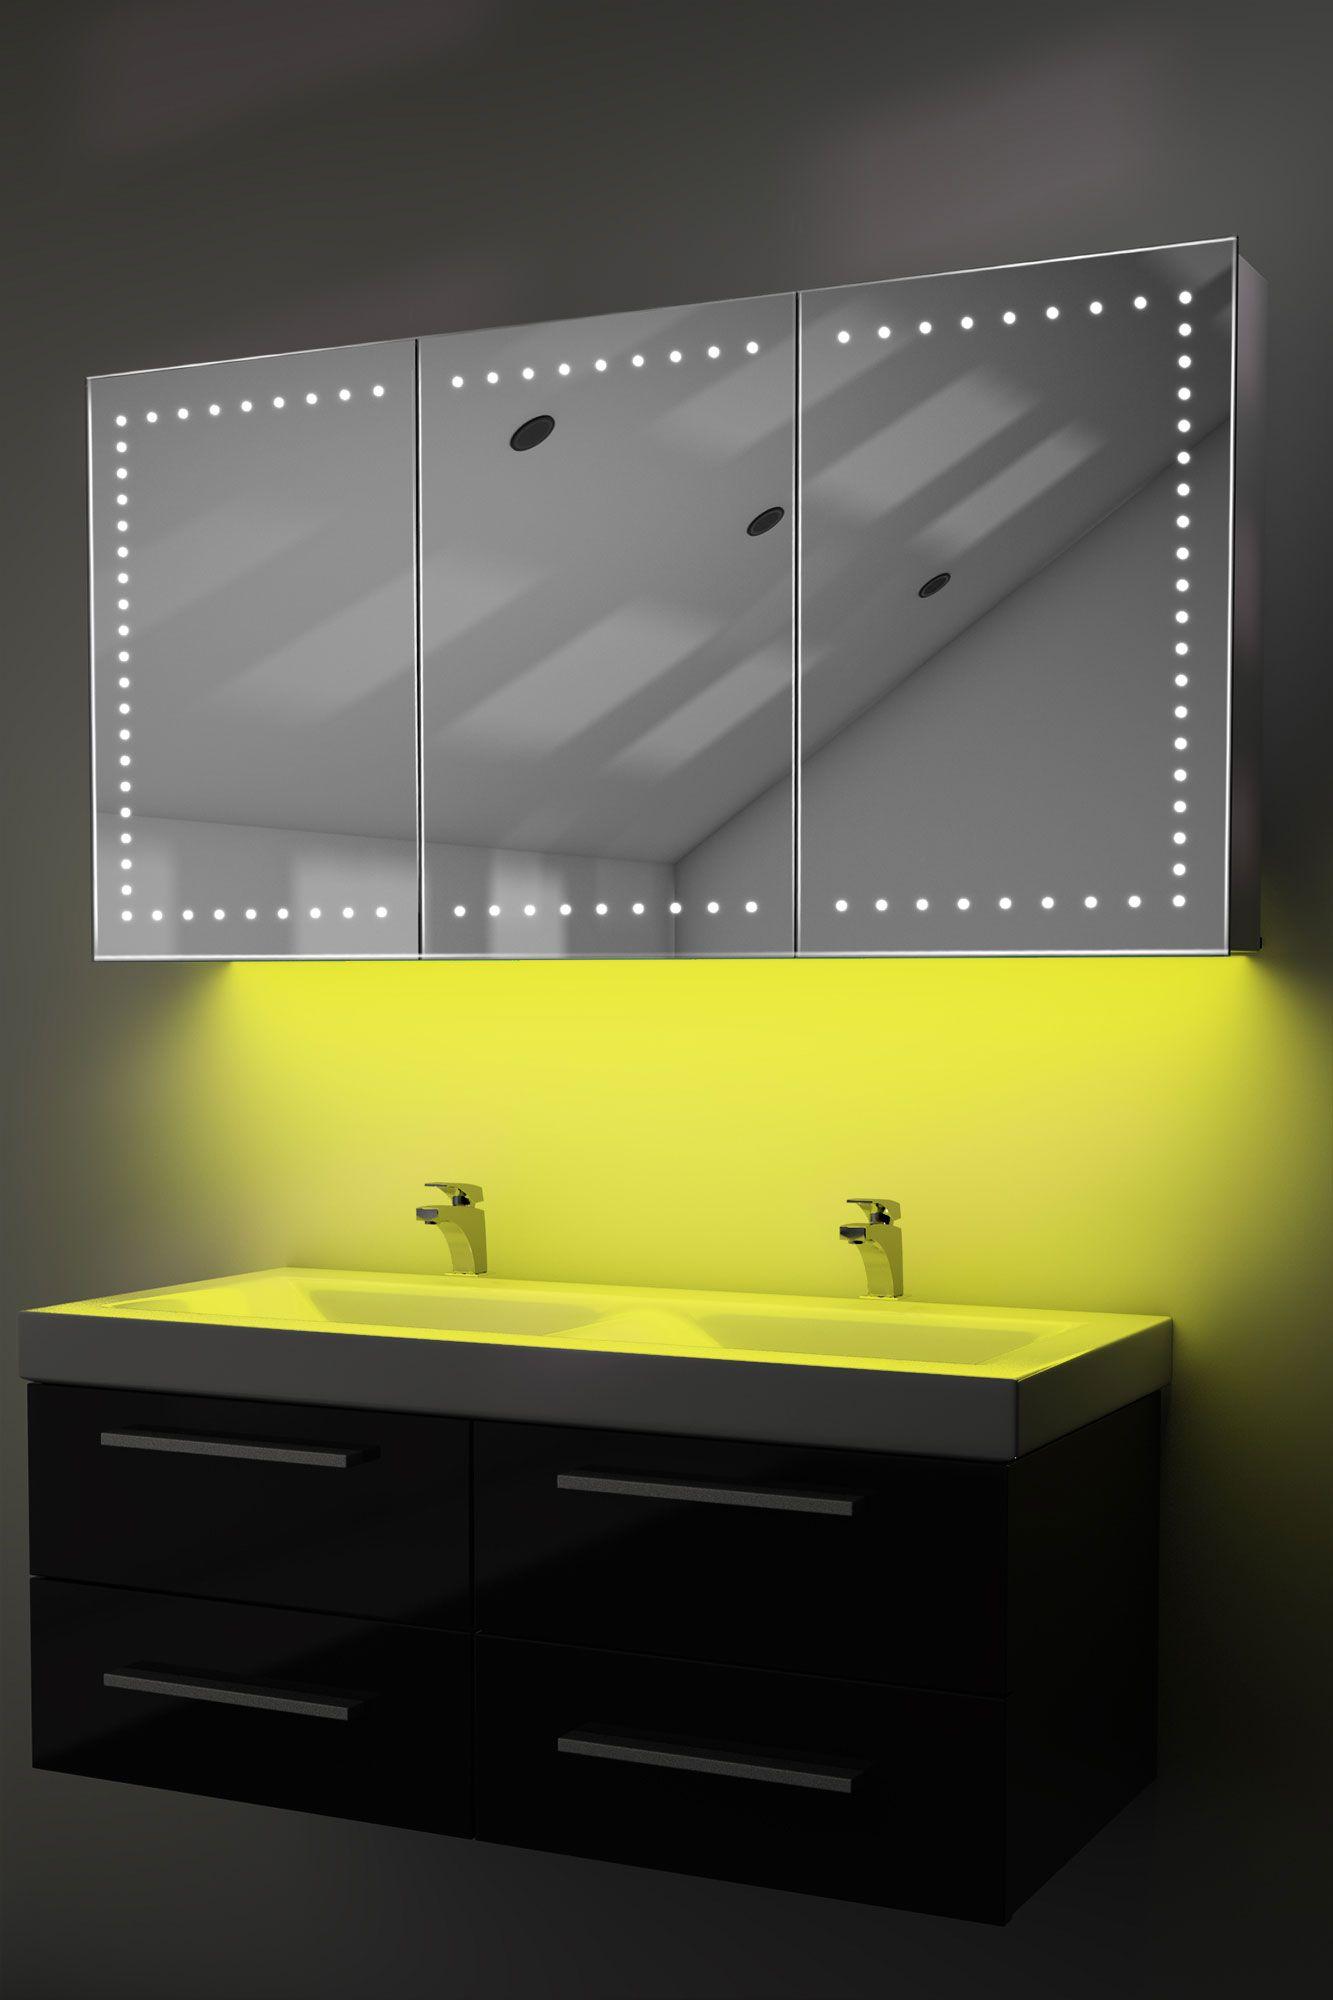 Demist Cabinet With Led Under Lighting Sensor Amp Internal Shaver Socket K377y Bathroom Mirror Frames On Wall Interior Lighting